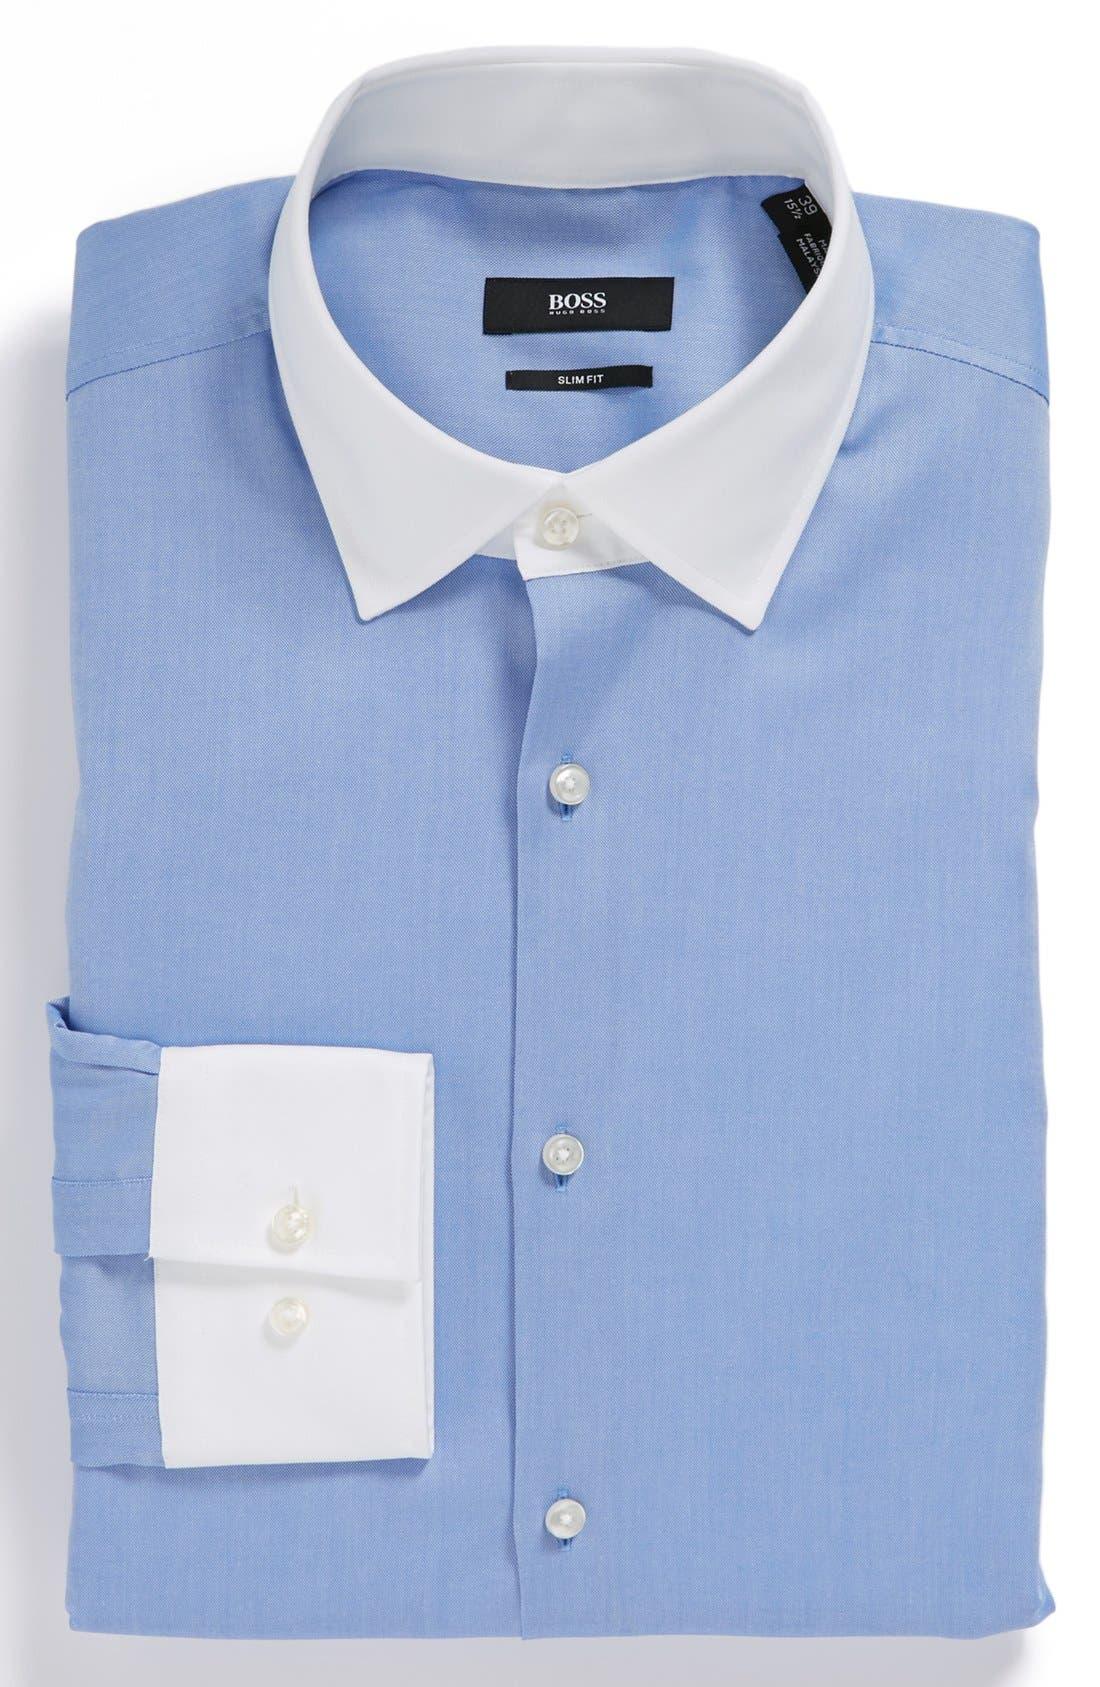 Main Image - BOSS HUGO BOSS 'Jonne' Slim Fit Easy Iron Dress Shirt